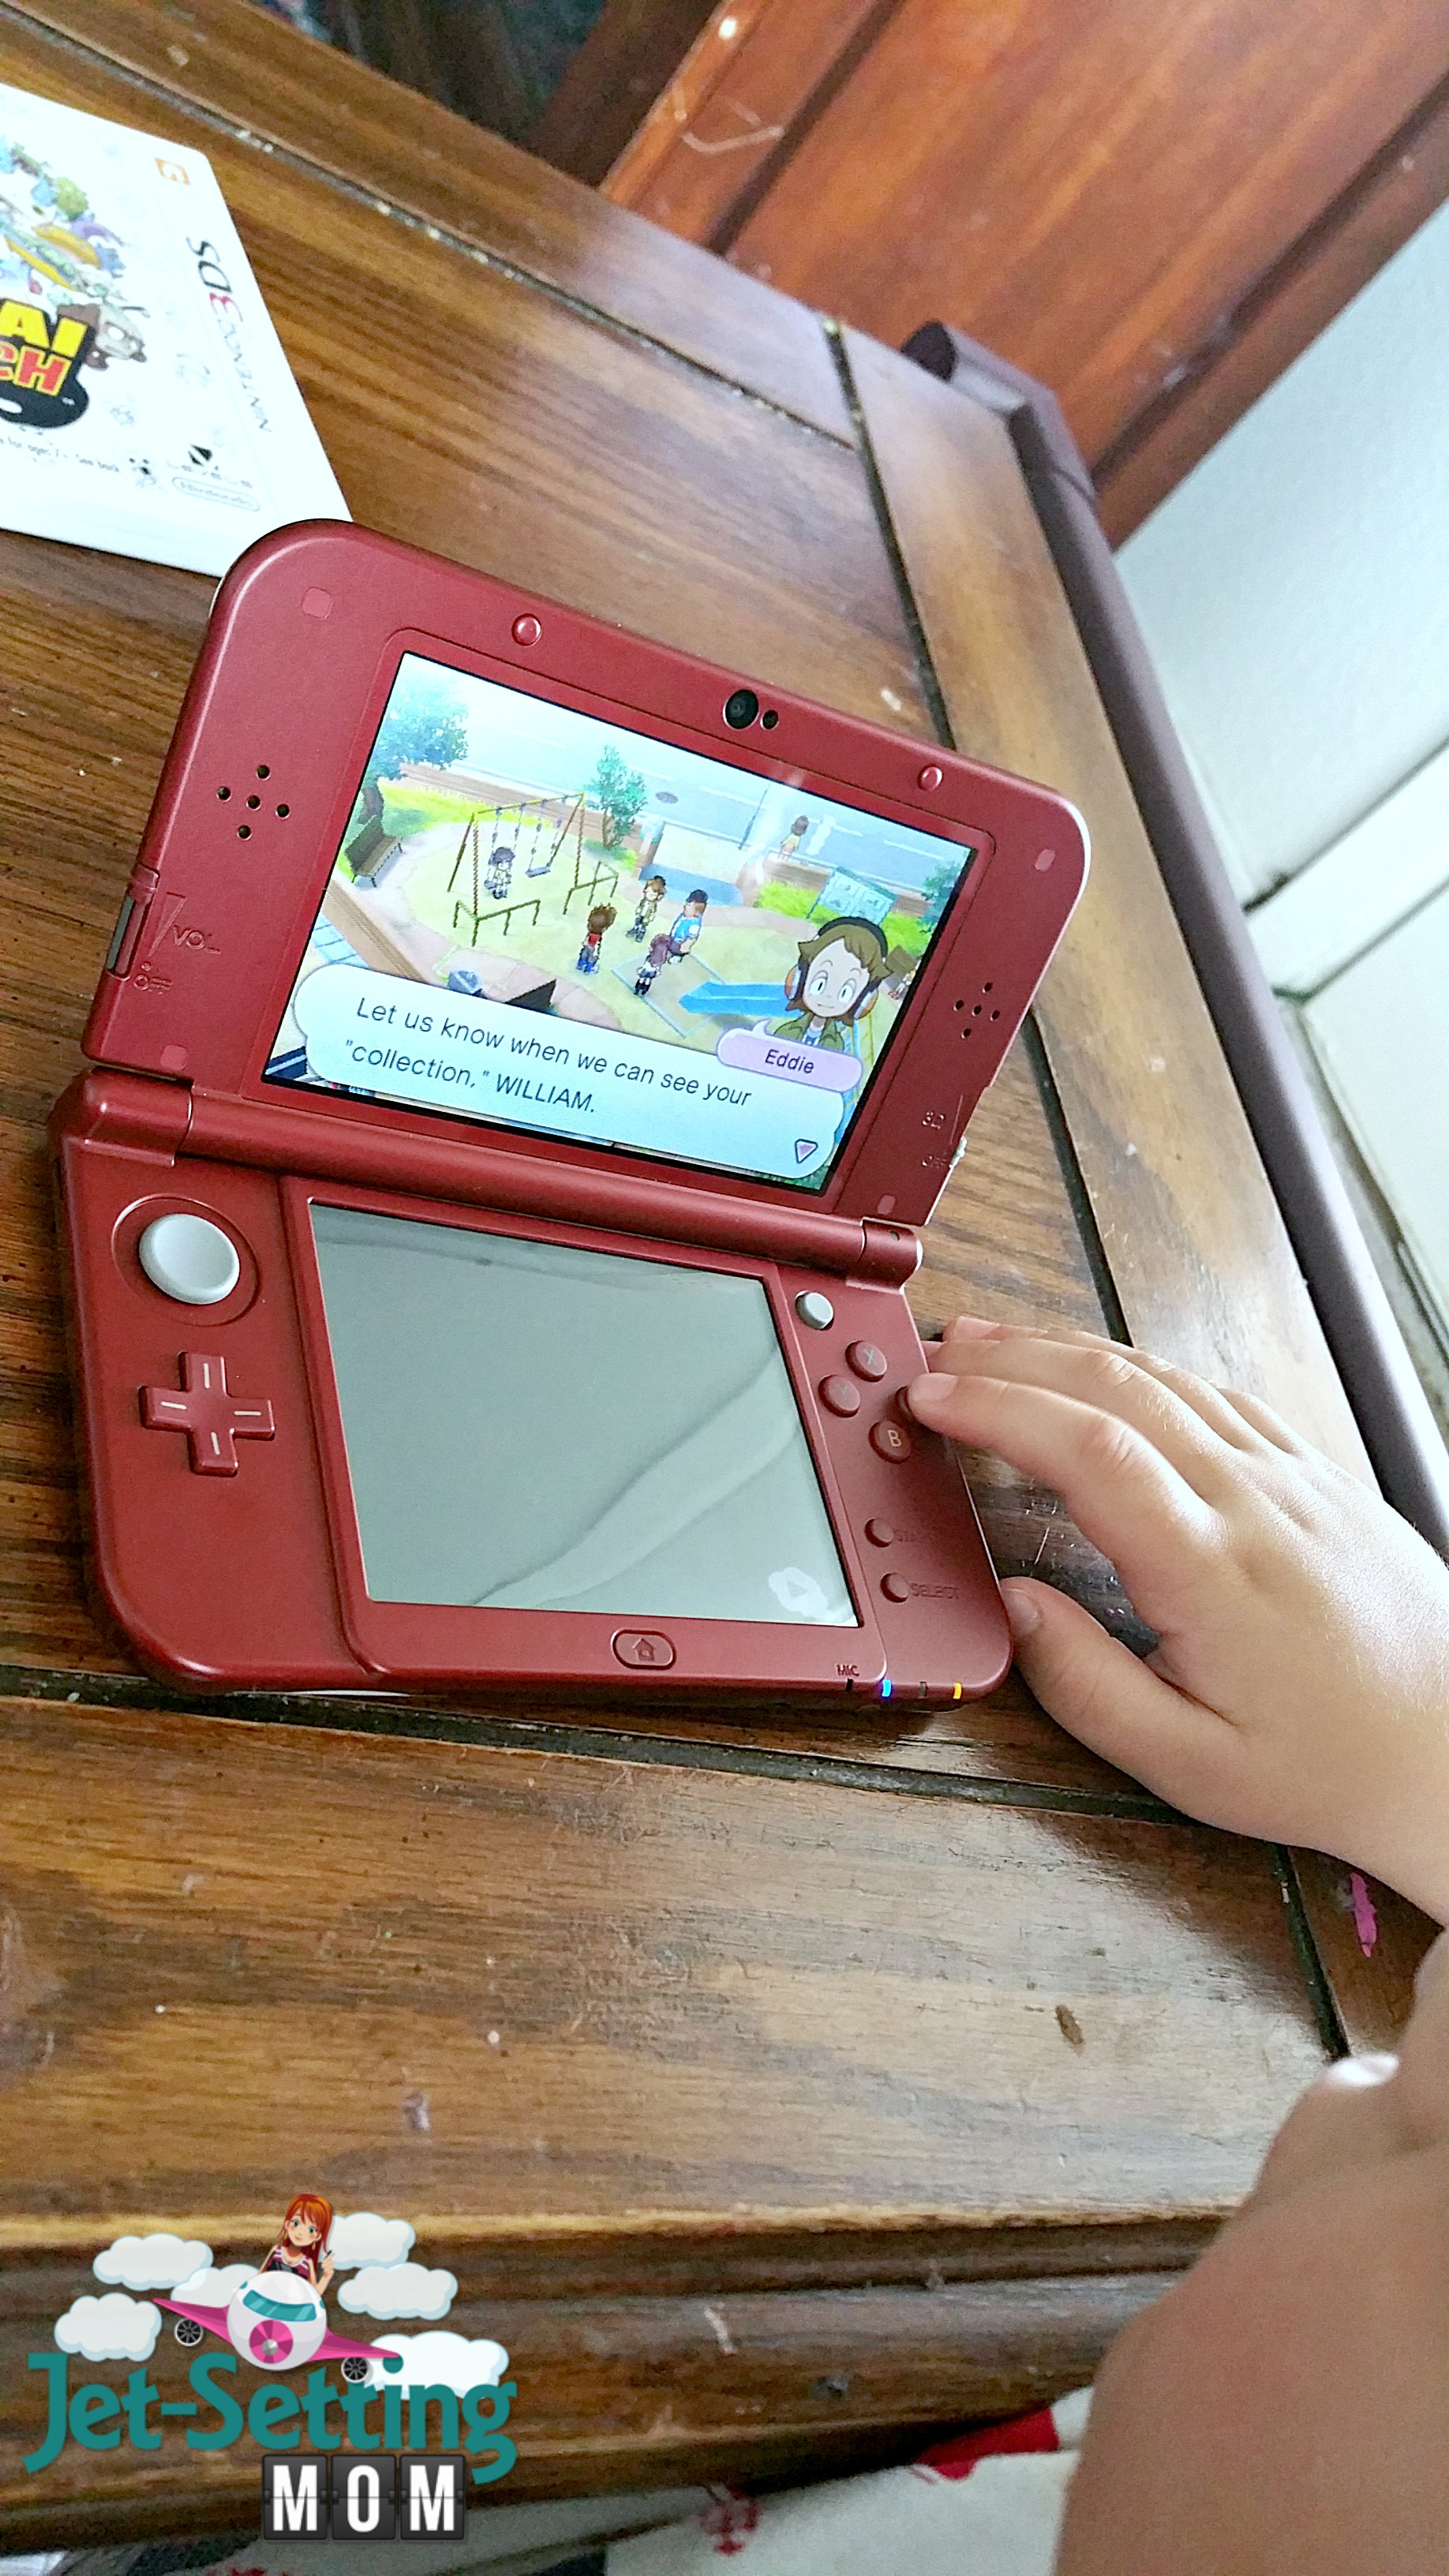 My kiddos love playing the new Nintendo Yo-Kai Watch game!